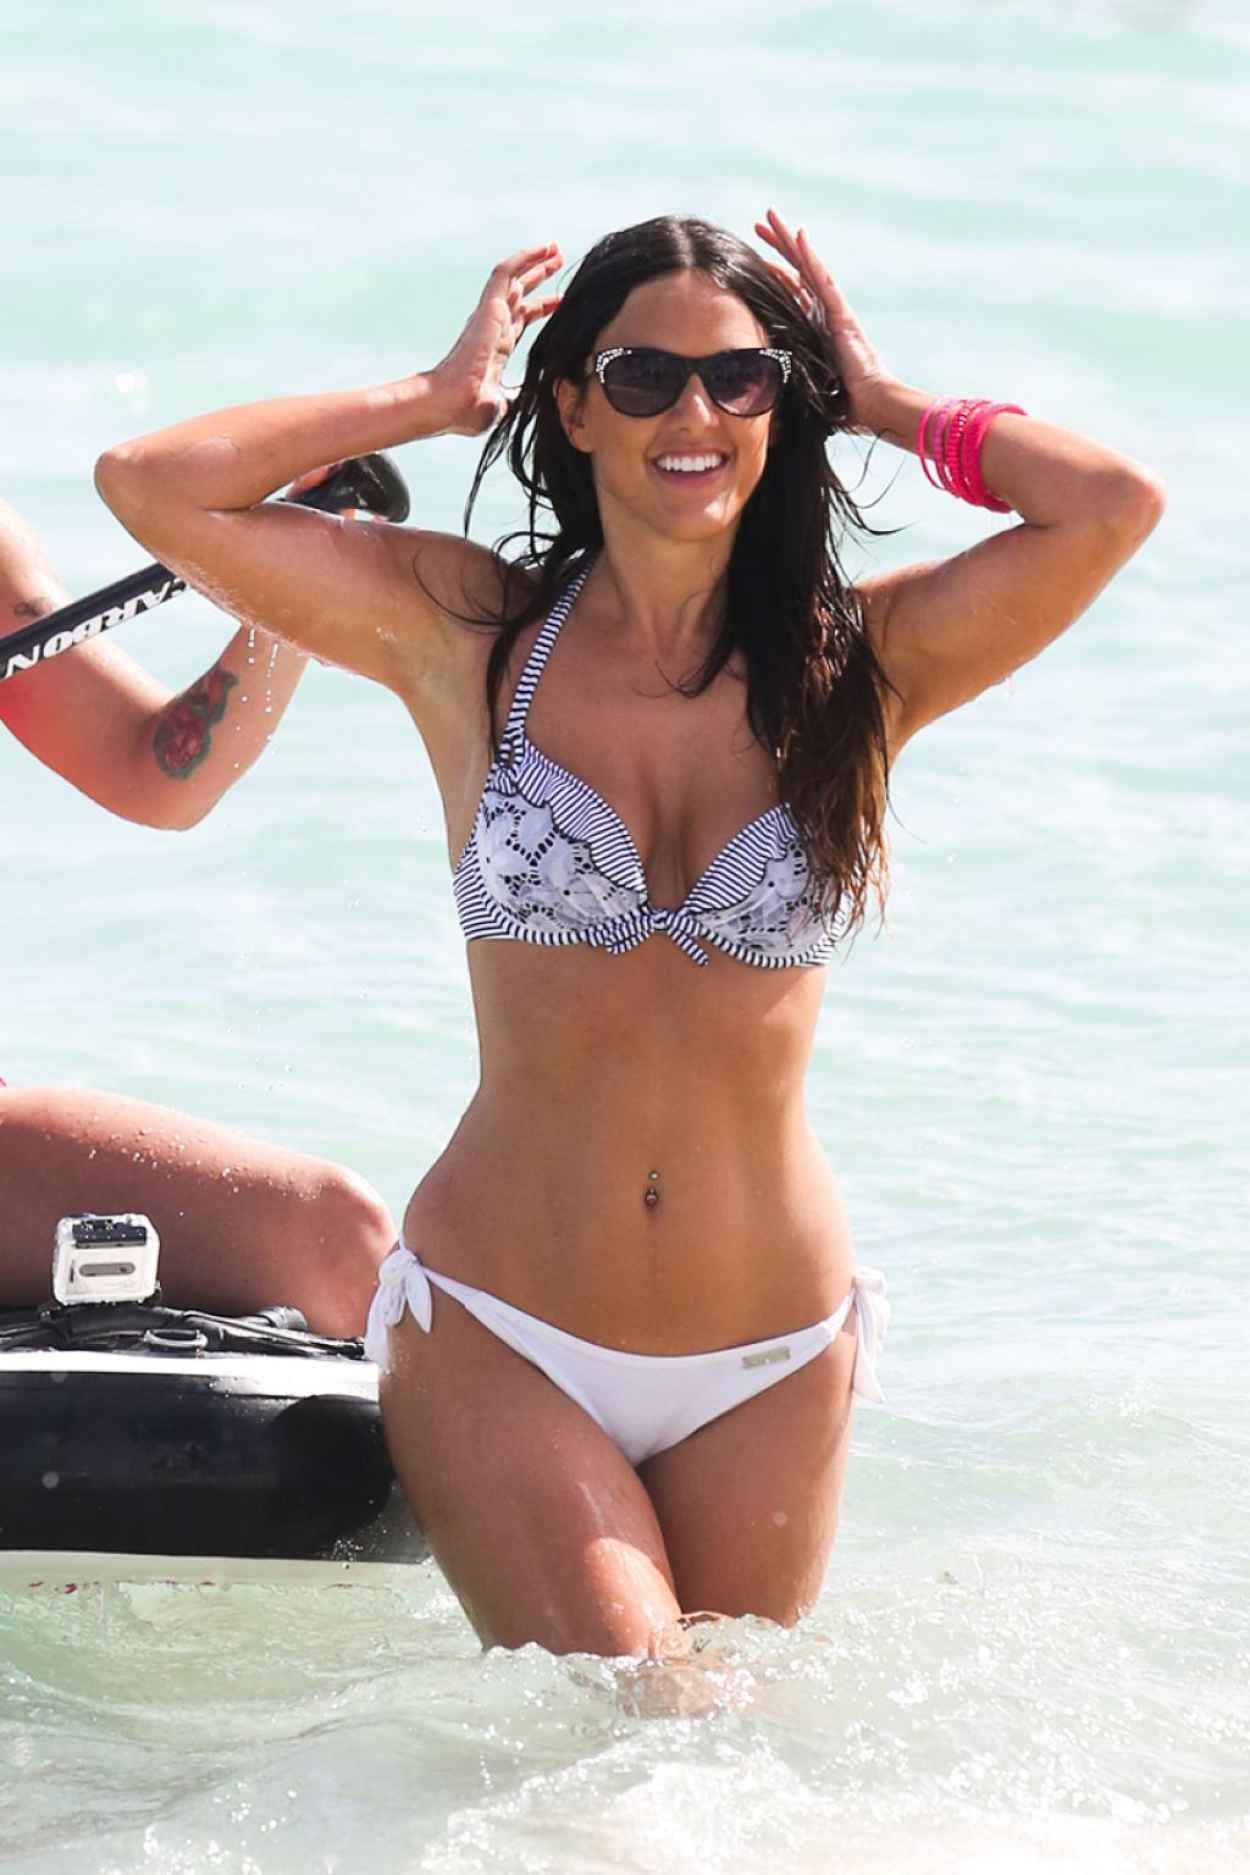 Claudia Romani Hot in Bikini - Showing off her Toned Body at a Beach in Miami - February 2015-1